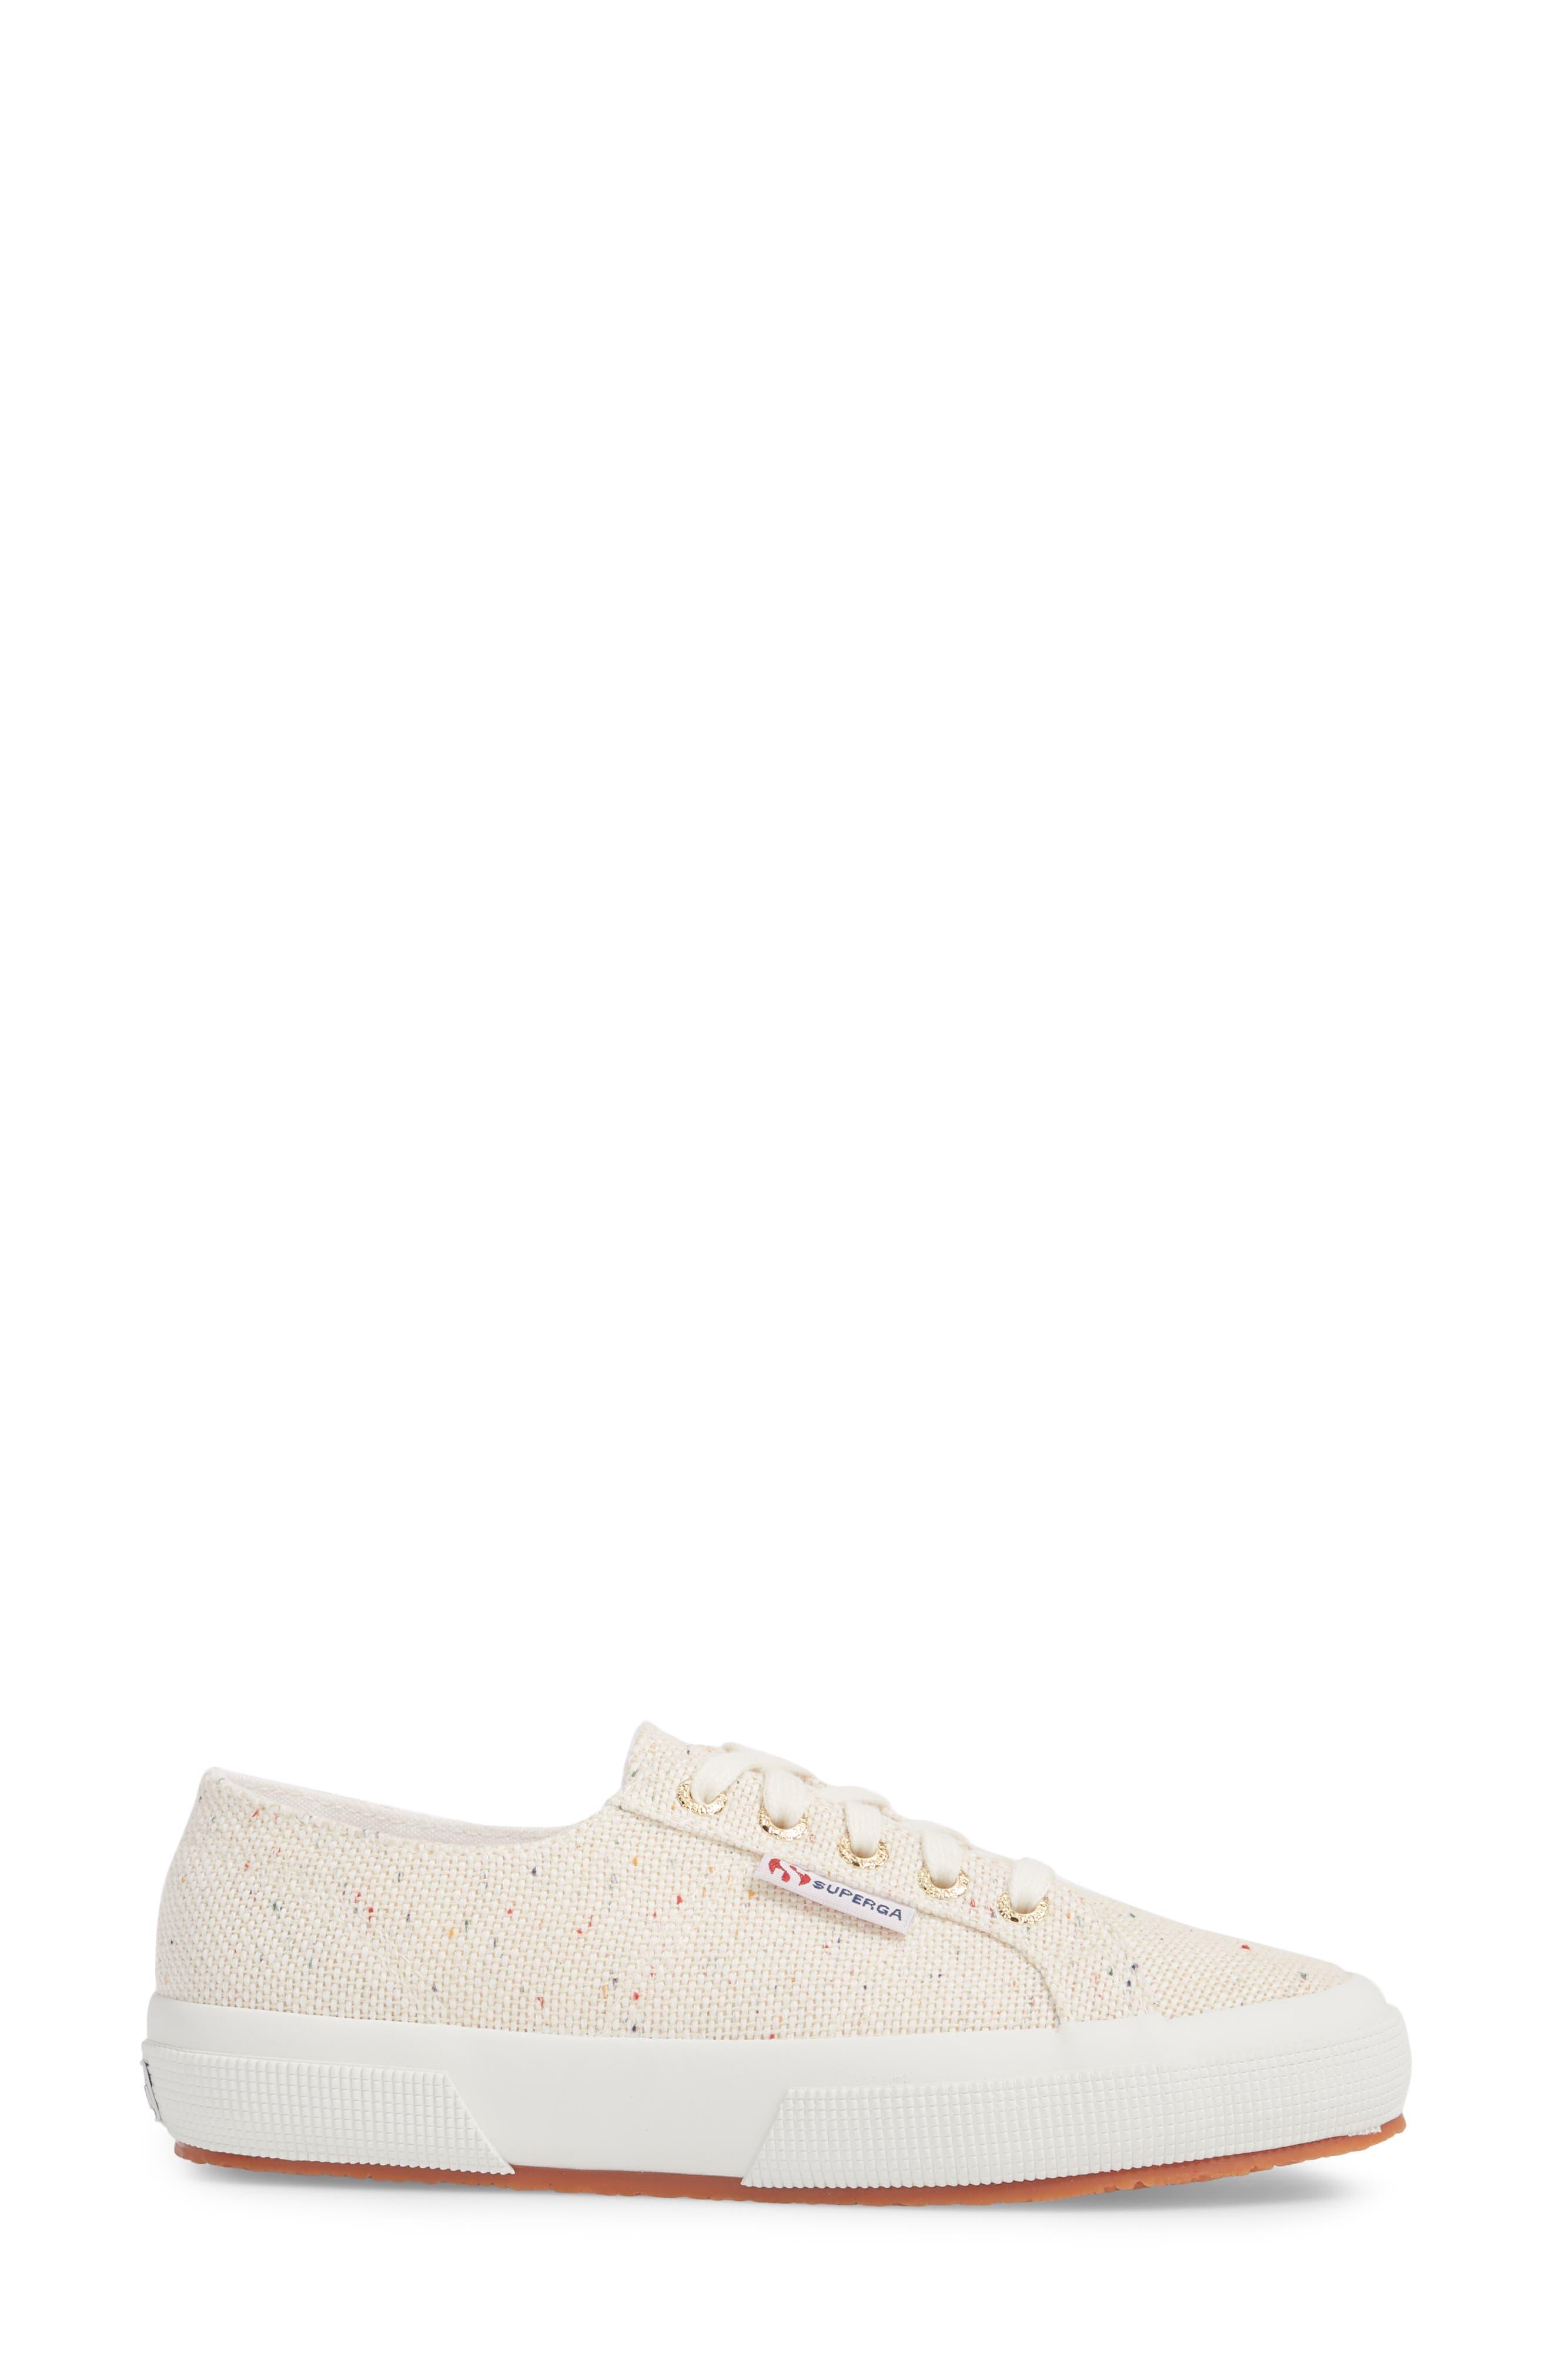 SUPERGA,                             2750 Speckle Low Top Sneaker,                             Alternate thumbnail 3, color,                             900